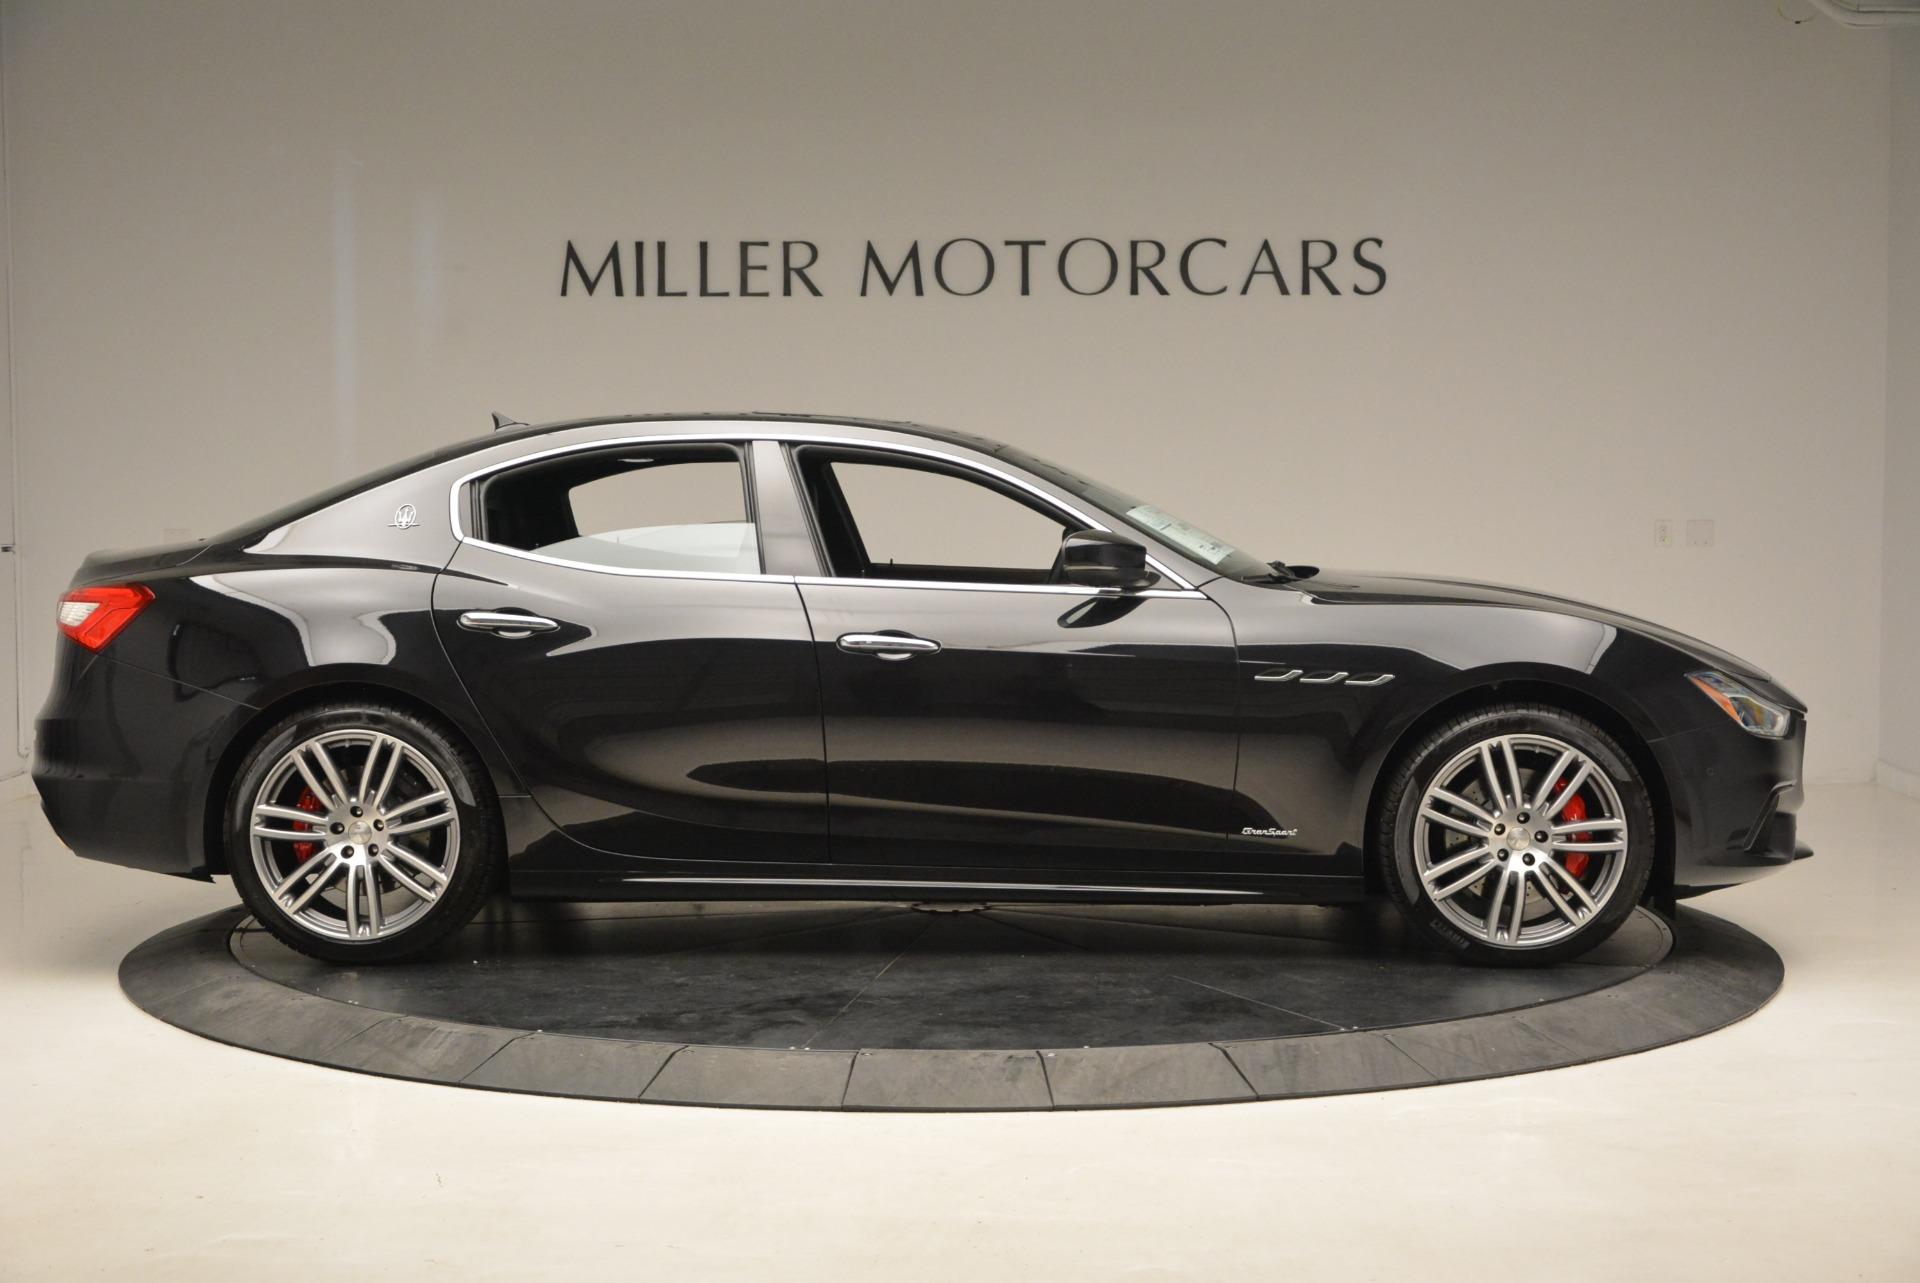 New 2018 Maserati Ghibli S Q4 Gransport For Sale In Greenwich, CT 2036_p9